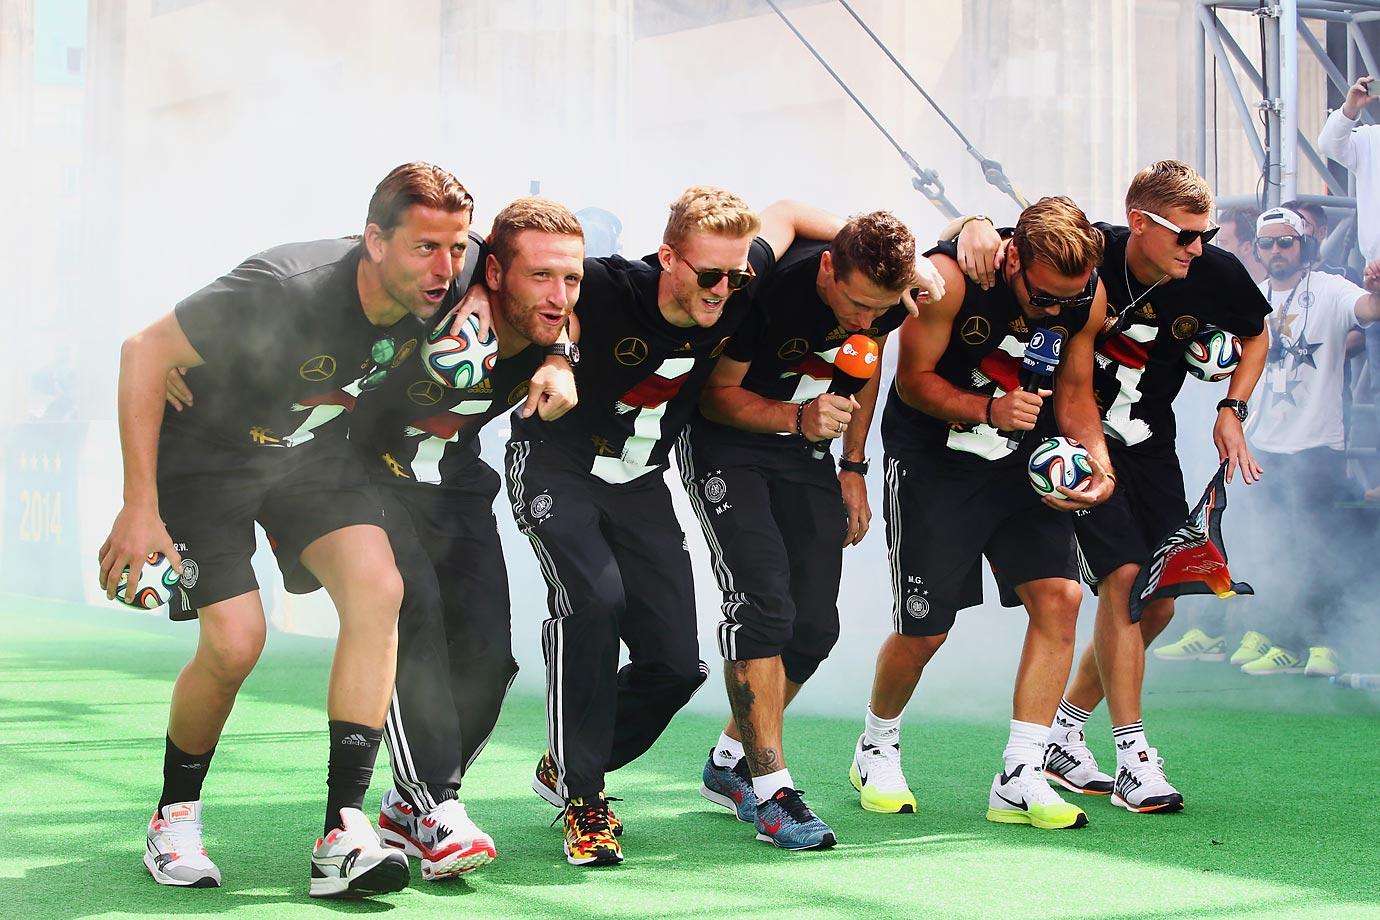 Roman Weidenfeller, Shkodran Mustafi, Andre Schuerrle, Miroslav Klose, Mario Goetze and Toni Kroos.